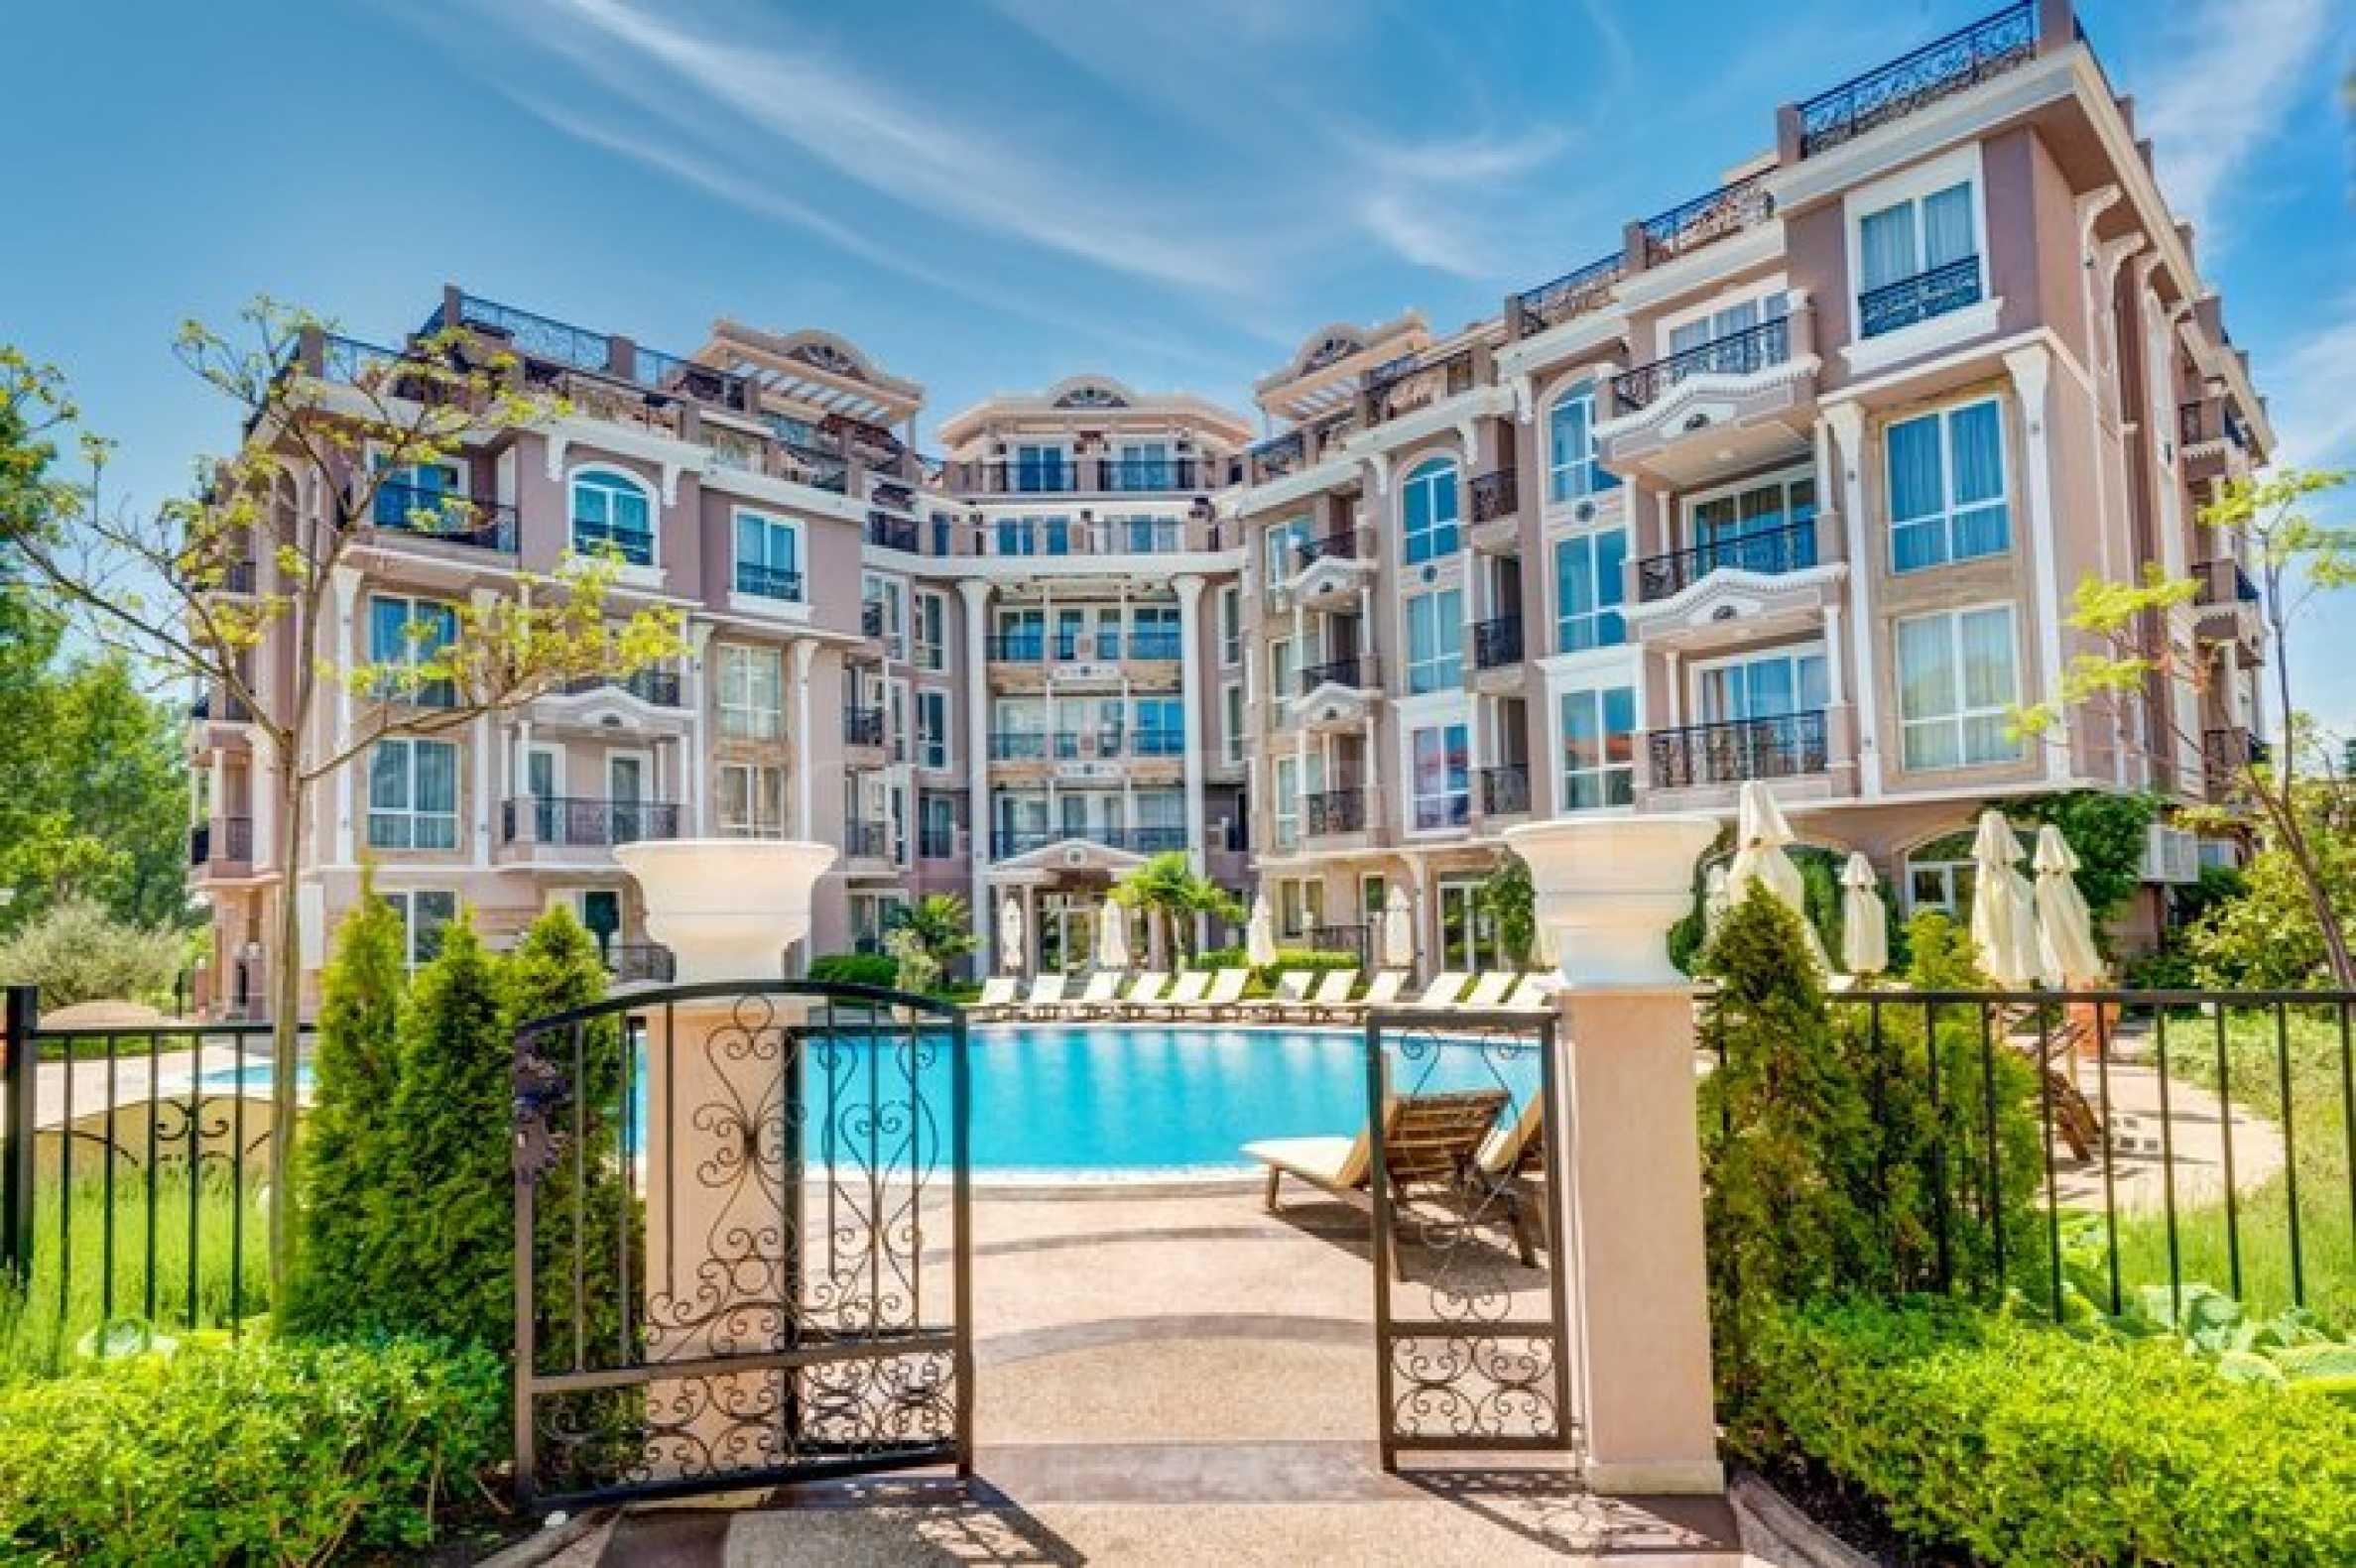 Апартаменти в разкошен комплекс с много удобства, к.к. Слънчев бряг2 - Stonehard